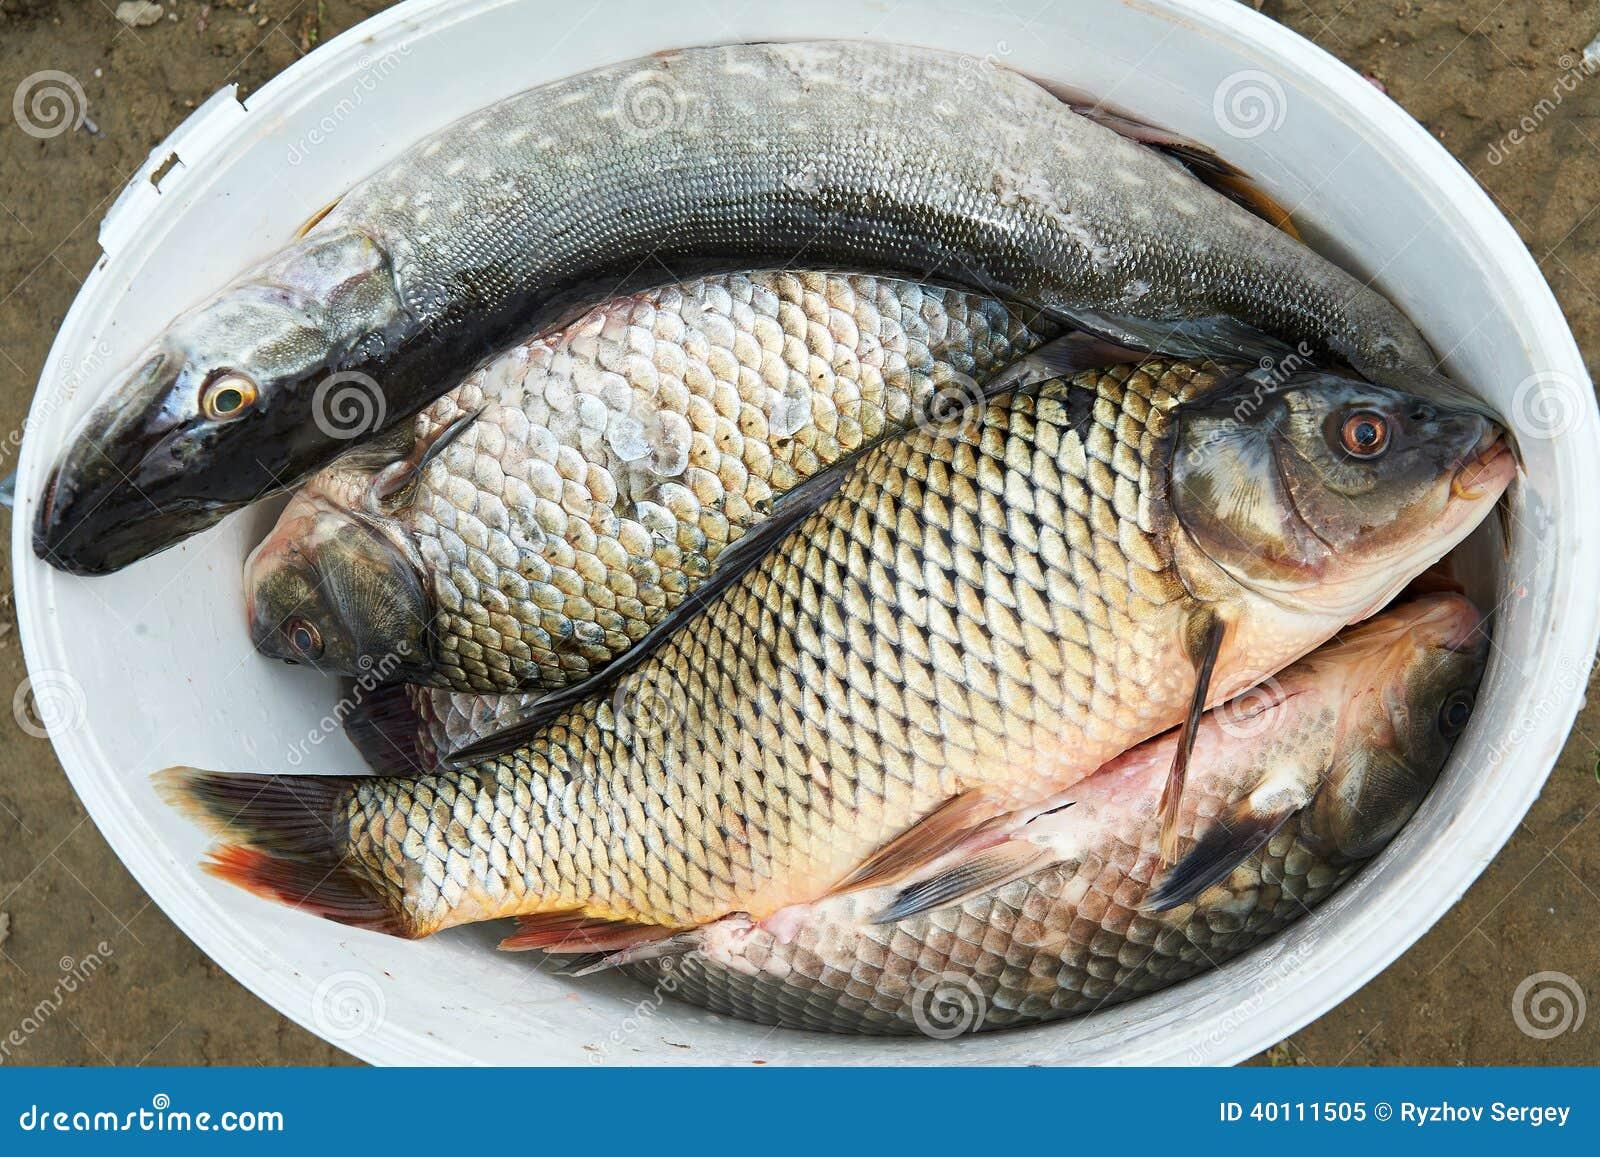 Fresh fish pike and carp stock photo image 40111505 for Bucket of fish